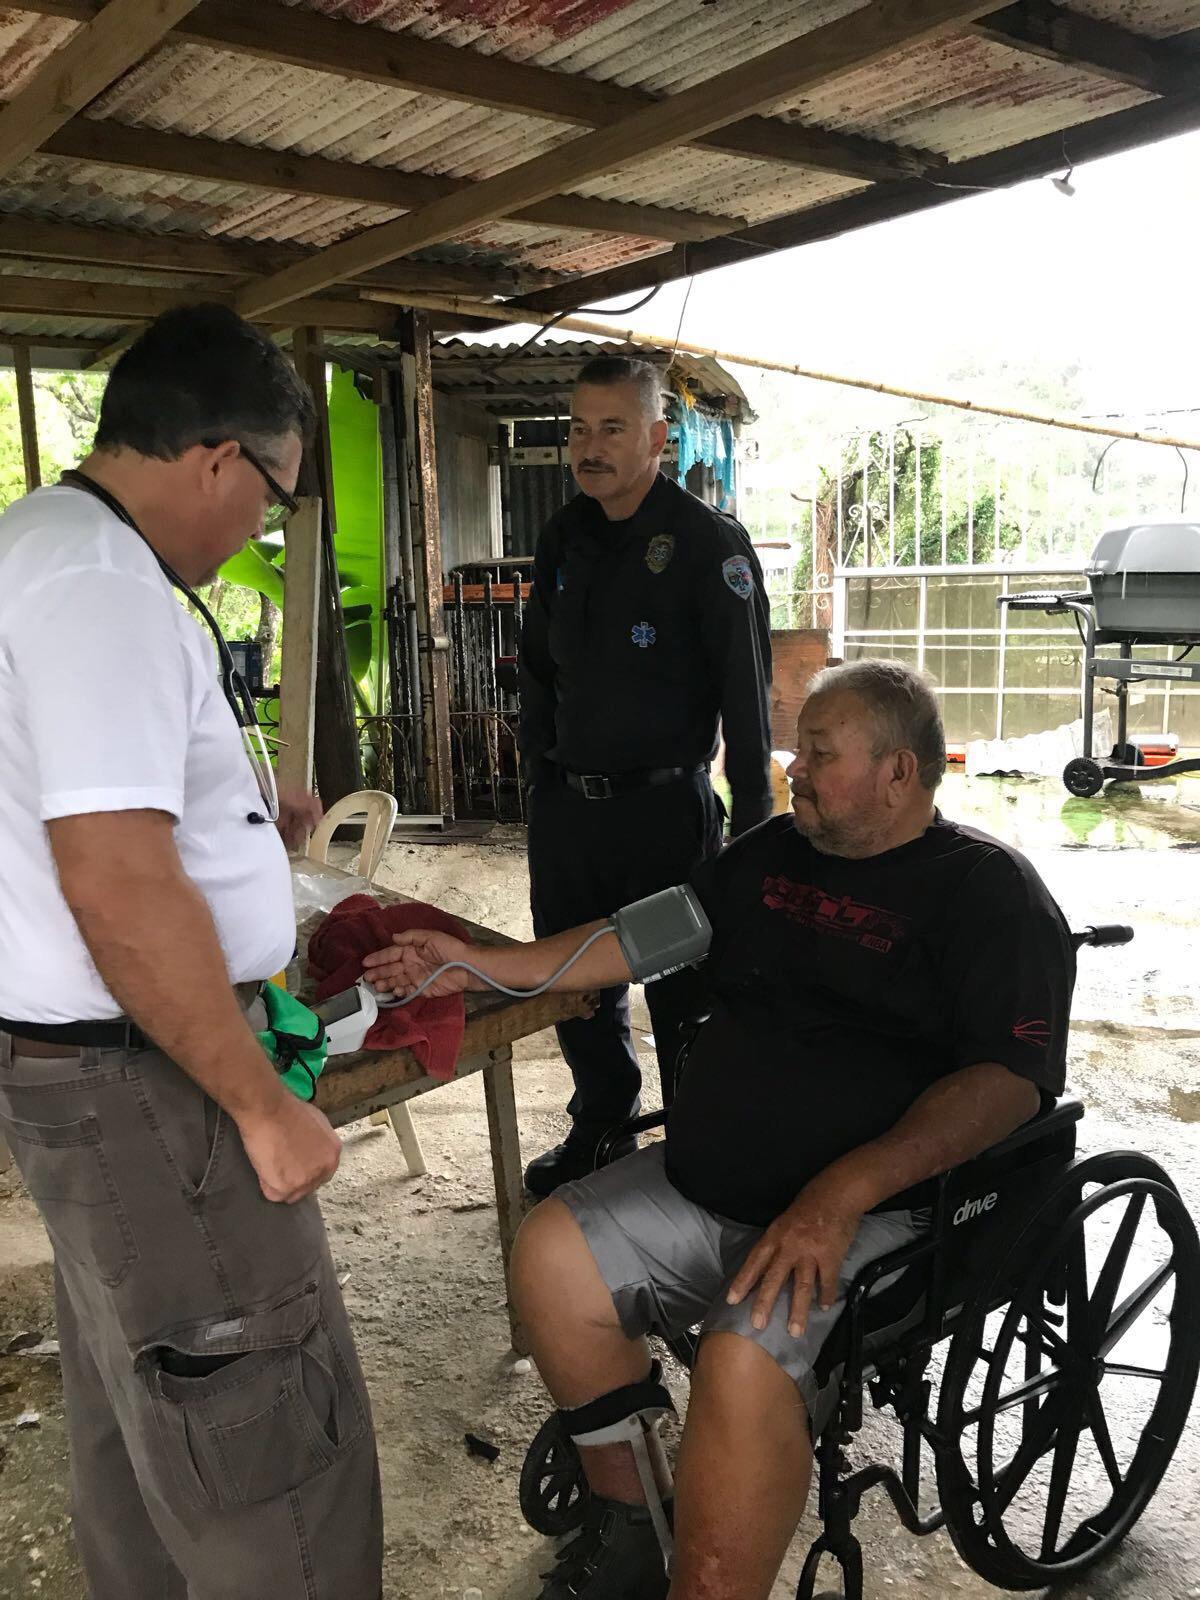 Medical mission to Ponce (La Carmelita, Guaraguao and Raices) with Mindu Futures